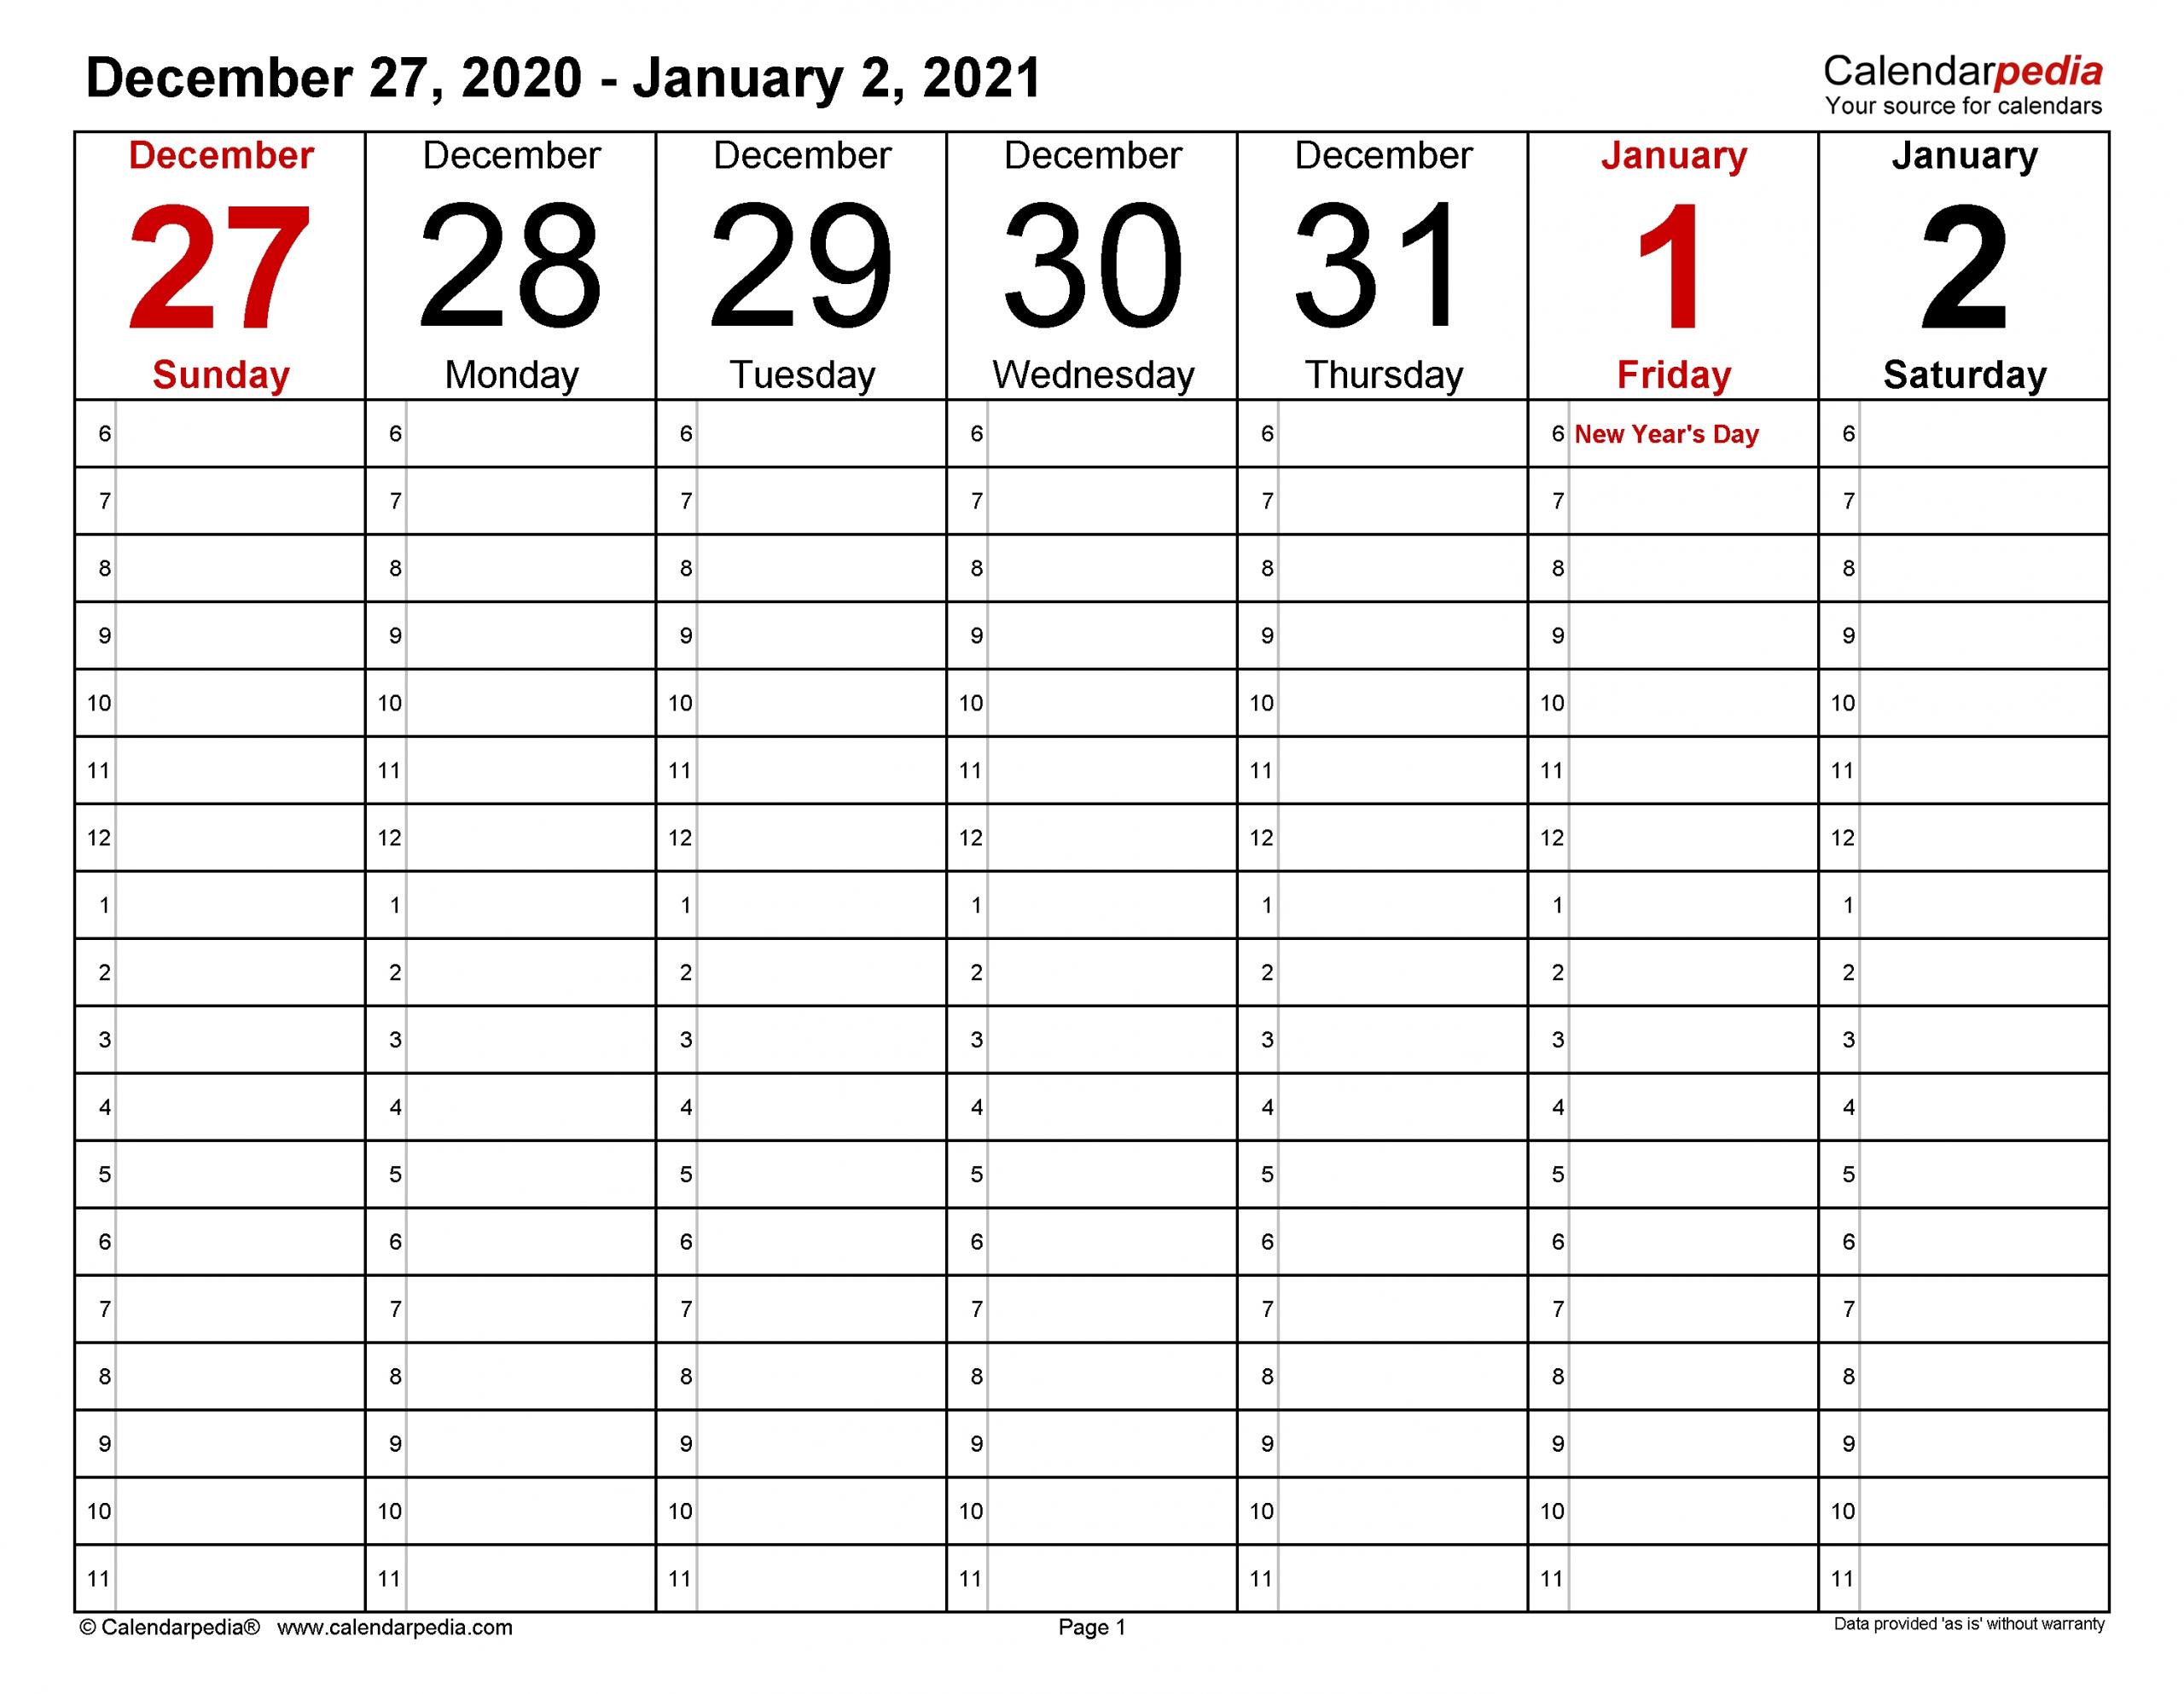 Weekly Calendars 2021 For Word - 12 Free Printable Templates  2021 Printable Hourly Calendar